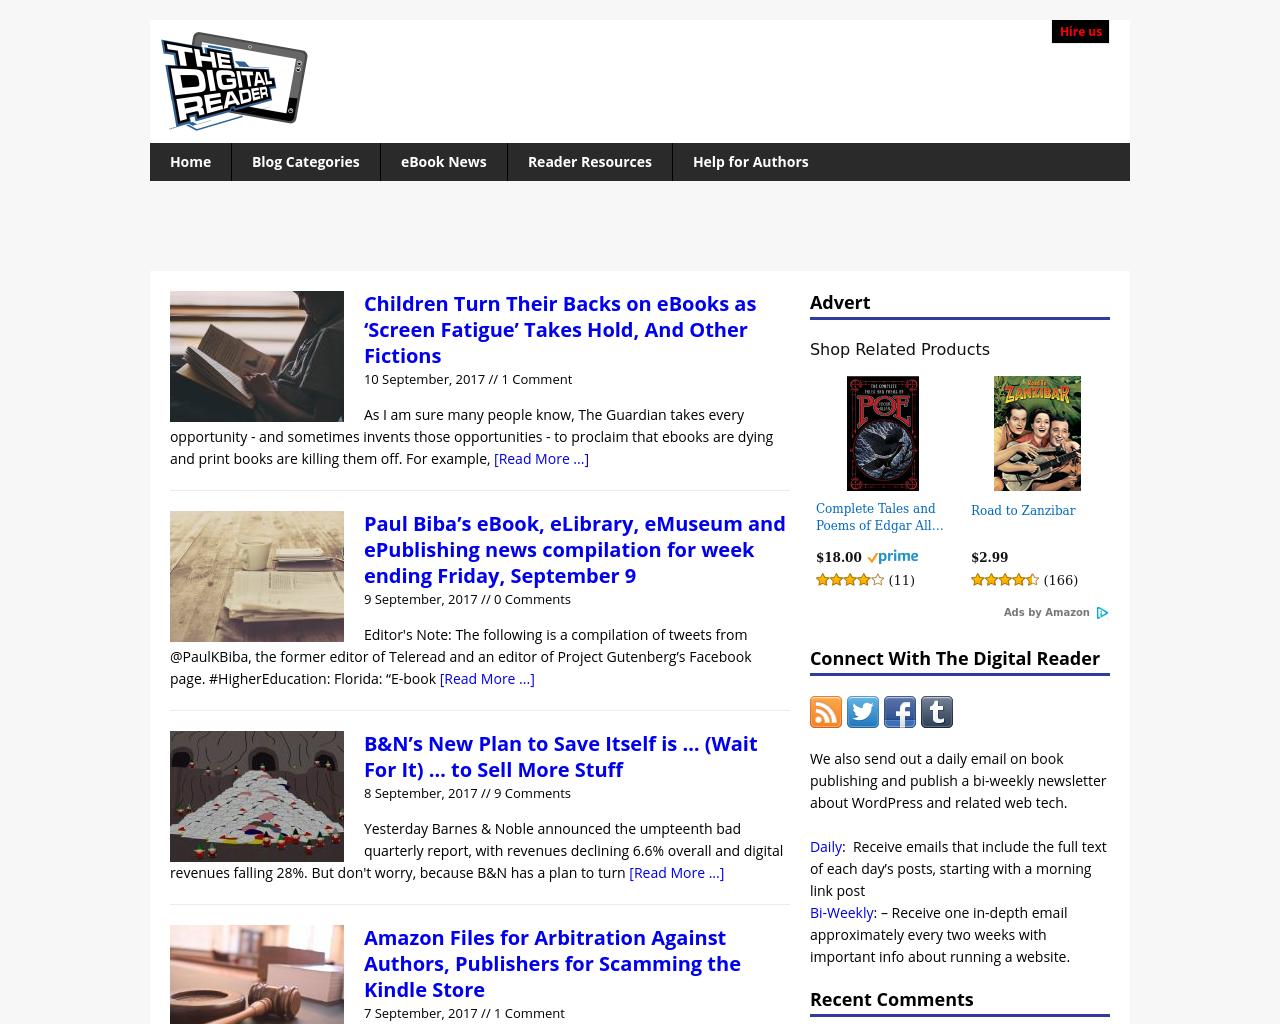 The-digital-reader-Advertising-Reviews-Pricing